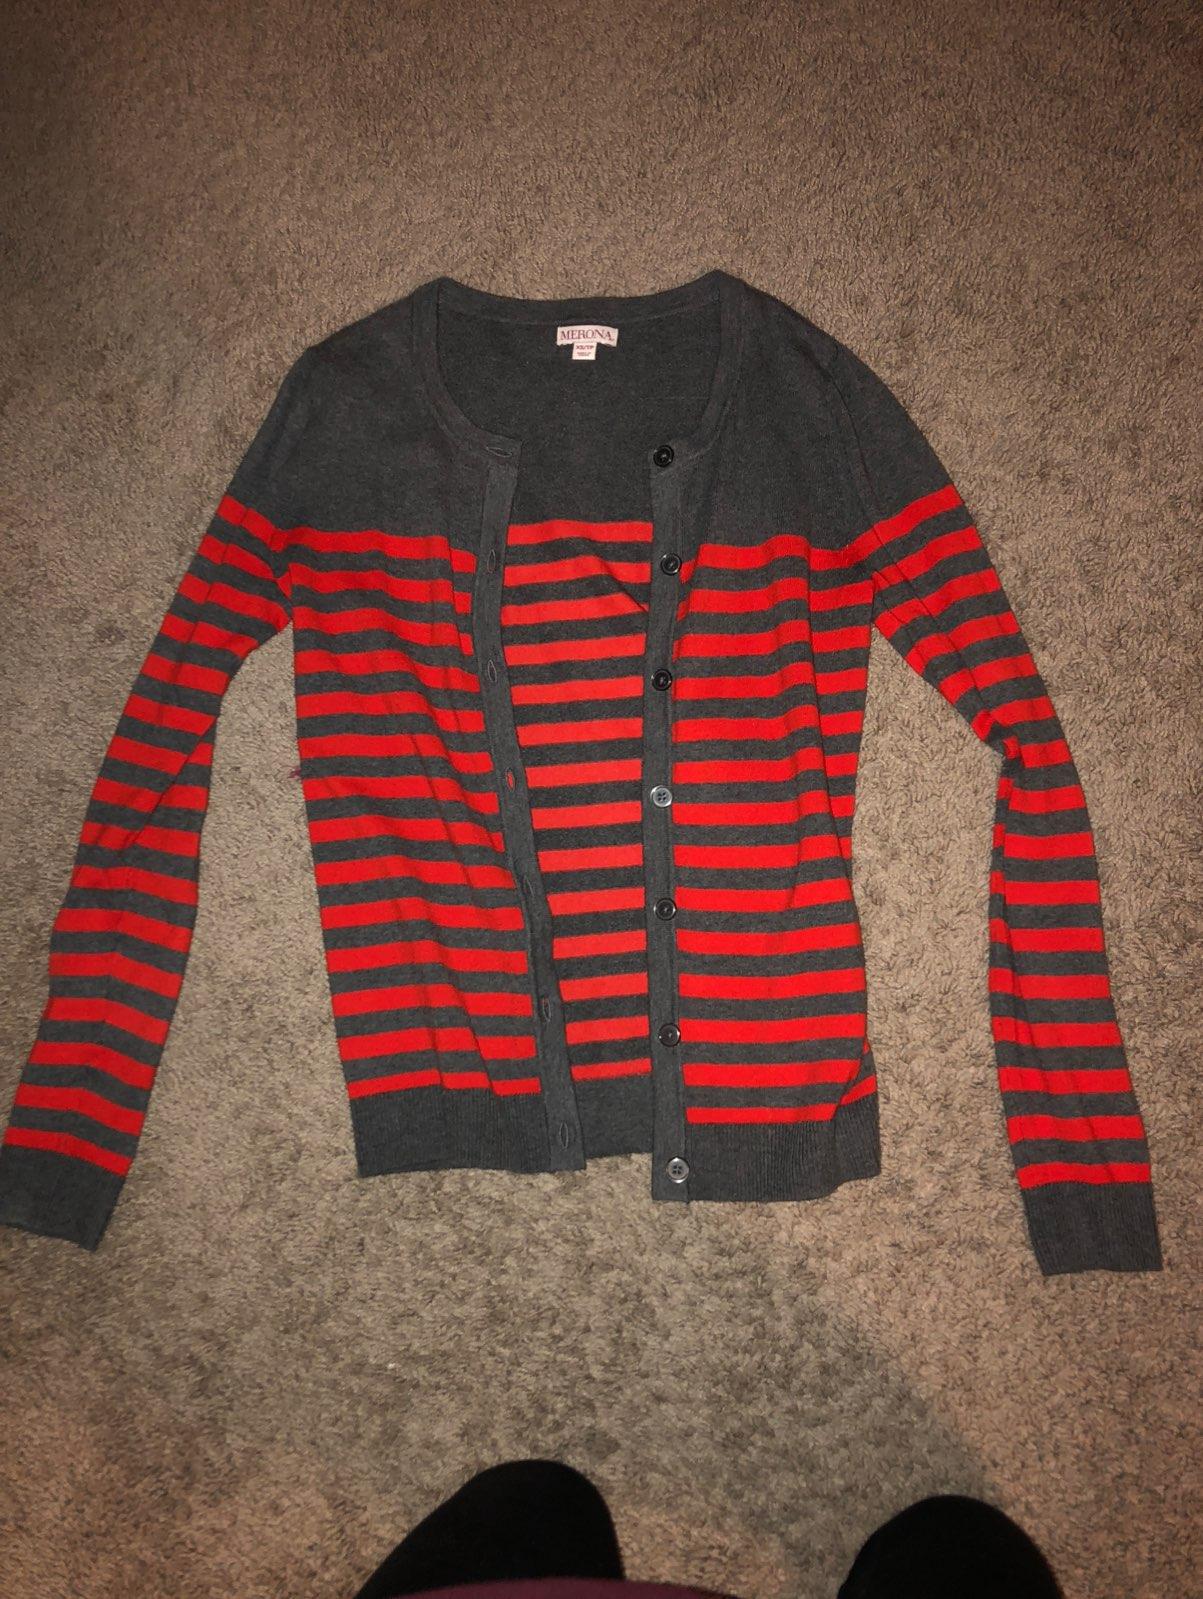 Gray/ orange striped cardigan - Mercari: BUY & SELL THINGS YOU LOVE